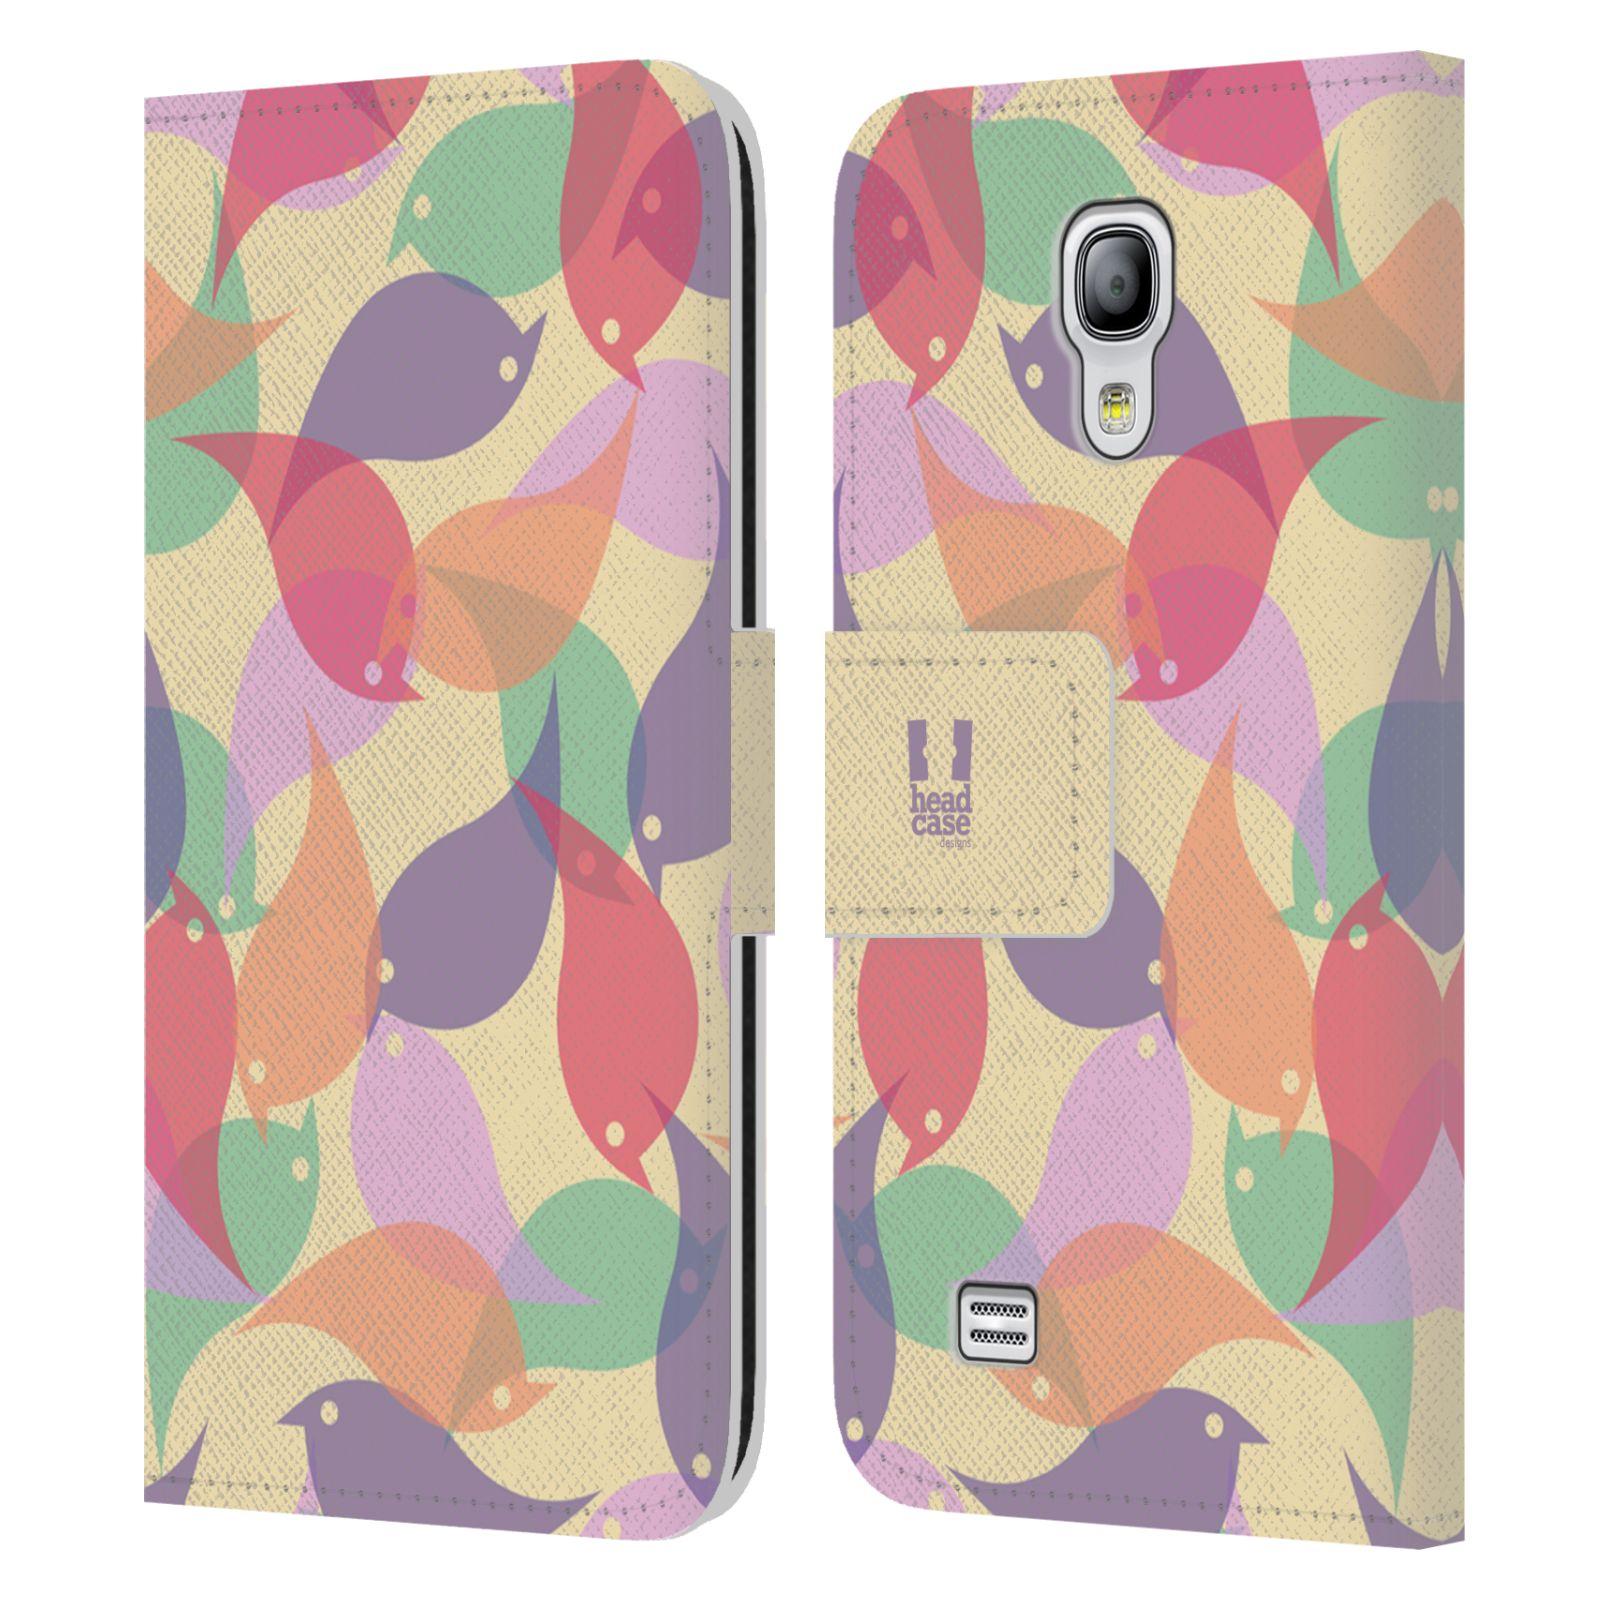 HEAD CASE Flipové pouzdro pro mobil Samsung Galaxy S4 MINI / S4 MINI DUOS vzor prolínající se ptáčci